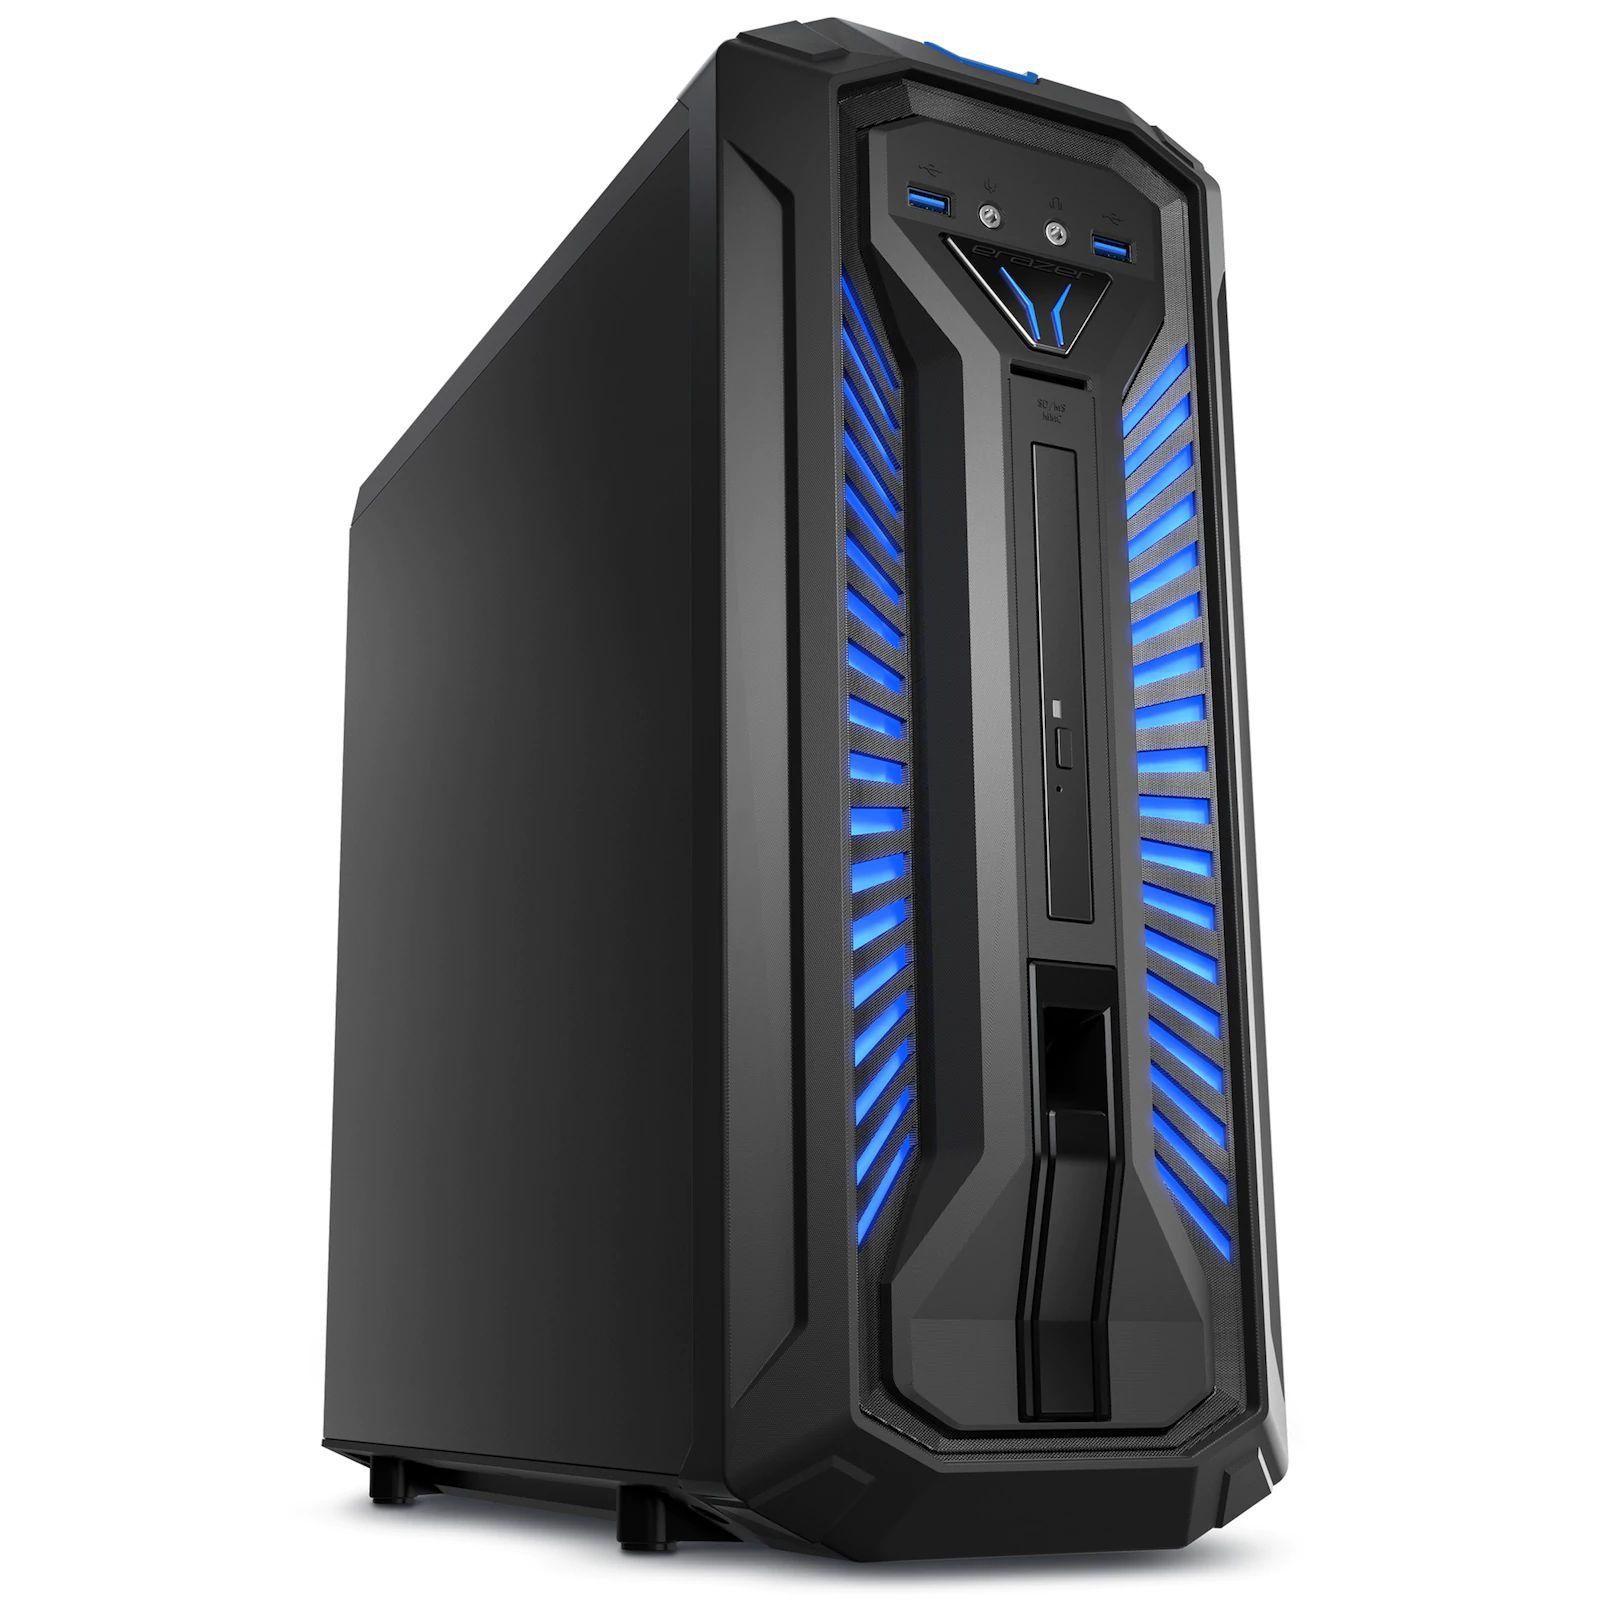 Pc Fixe Gamer Medion Erazer X67097 - i7-8700, GTX 1070, 16Go RAM, 256Go SSD (Frontaliers Suisse)